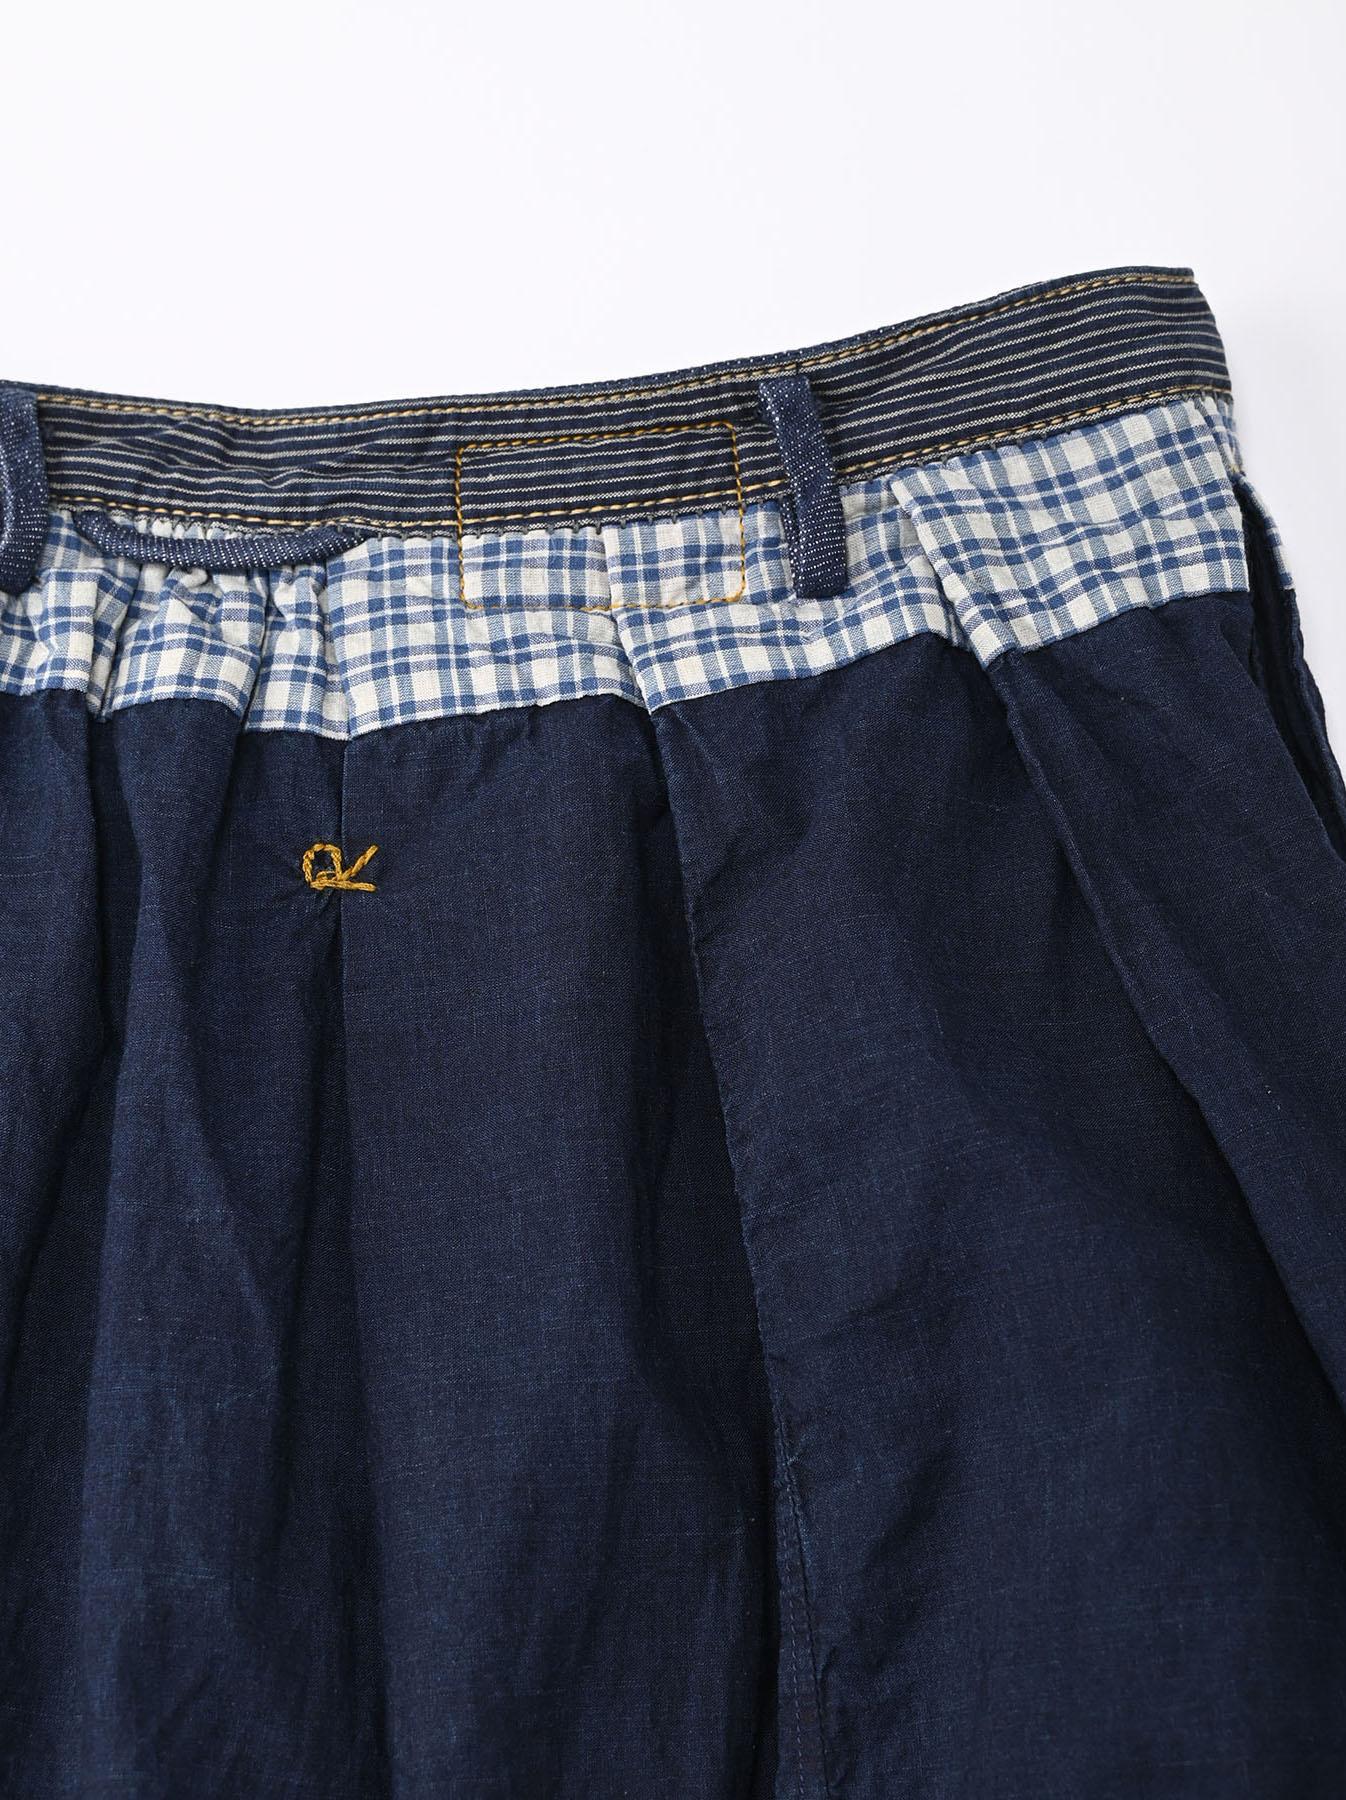 Indigo Tappet Patchwork Skirt-12